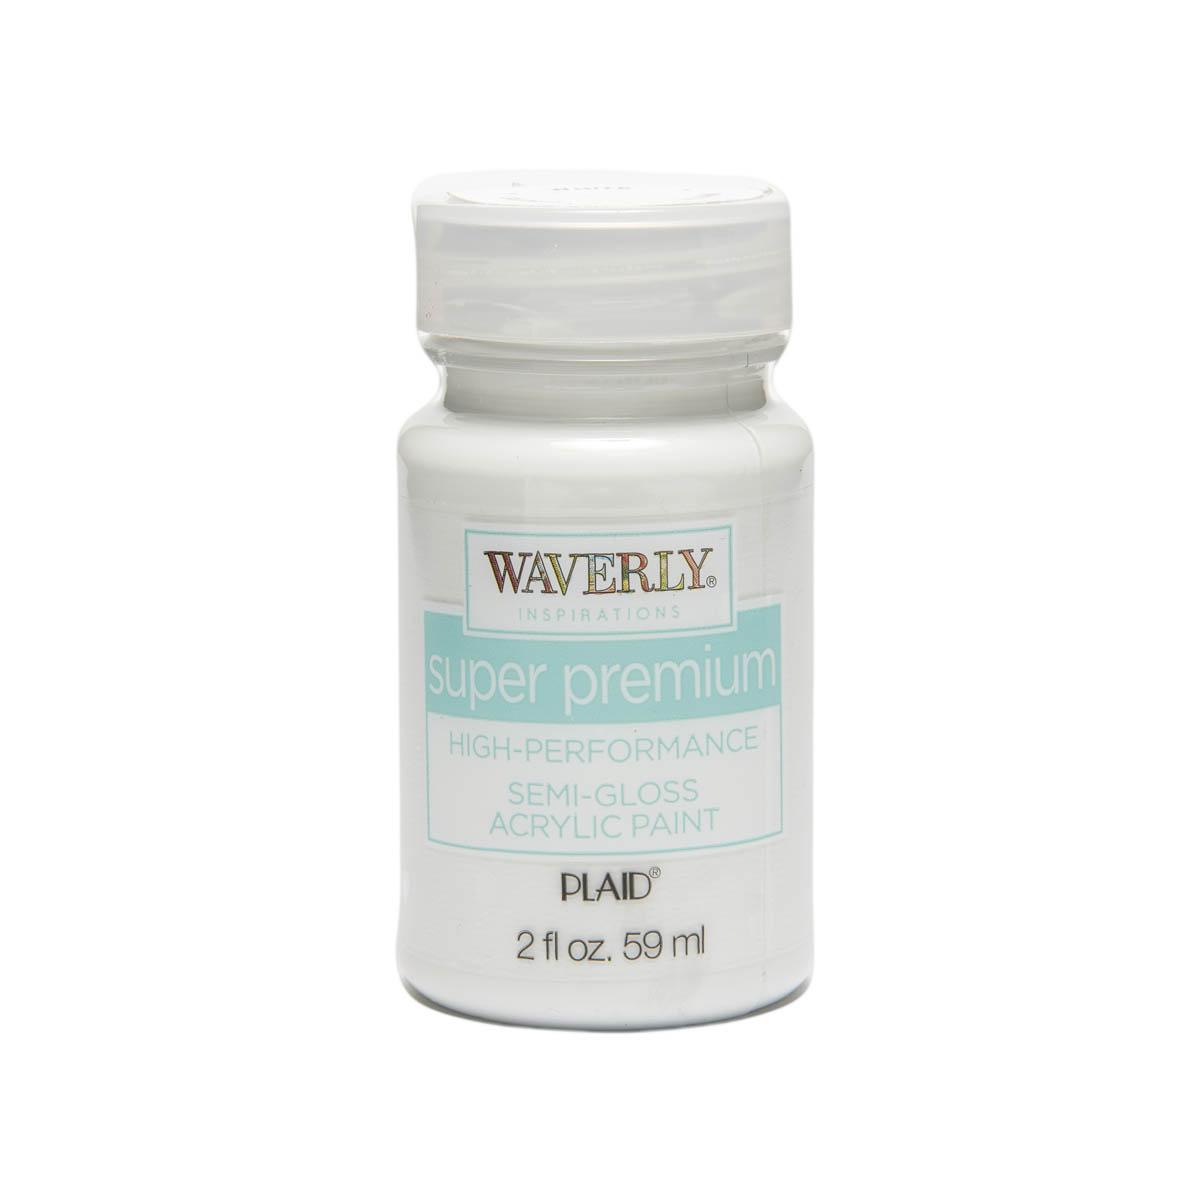 Waverly ® Inspirations Super Premium Semi-Gloss Acrylic Paint - White, 2 oz.